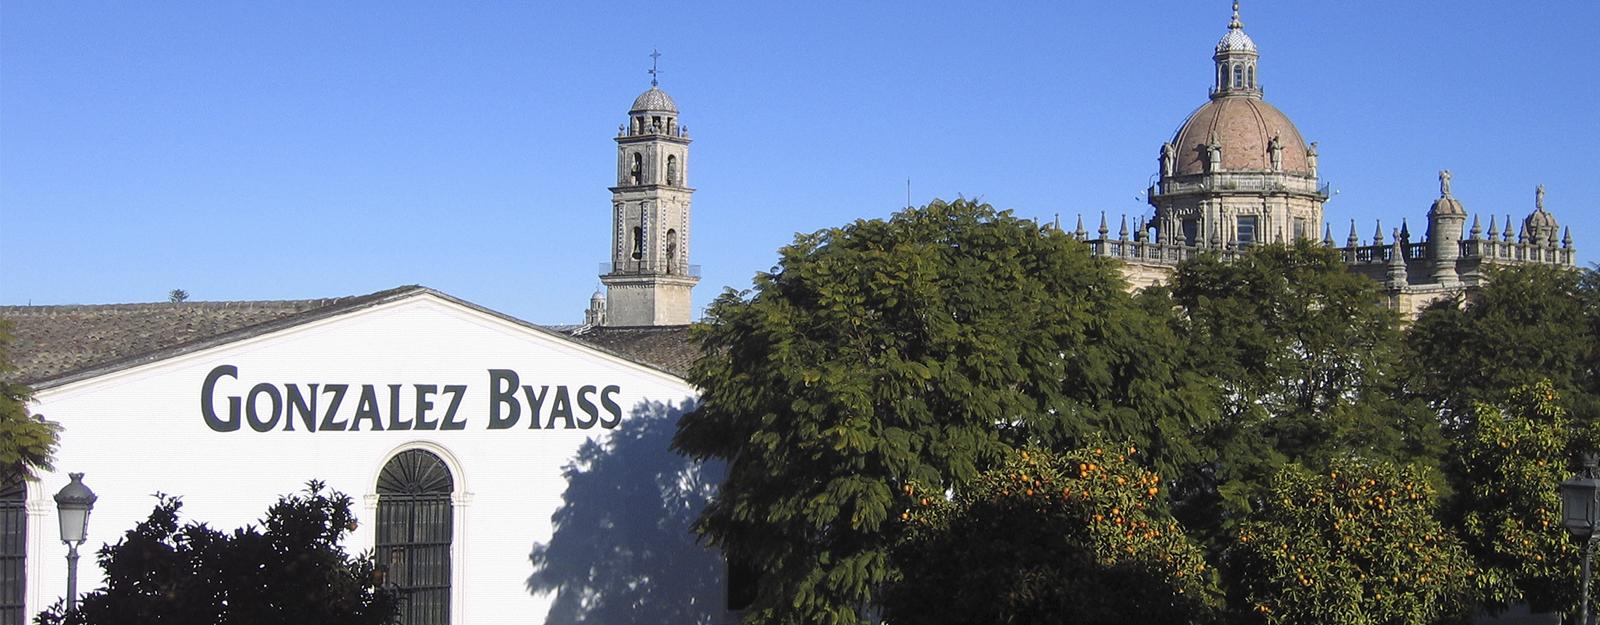 González Byass, la mejor bodega europea del año